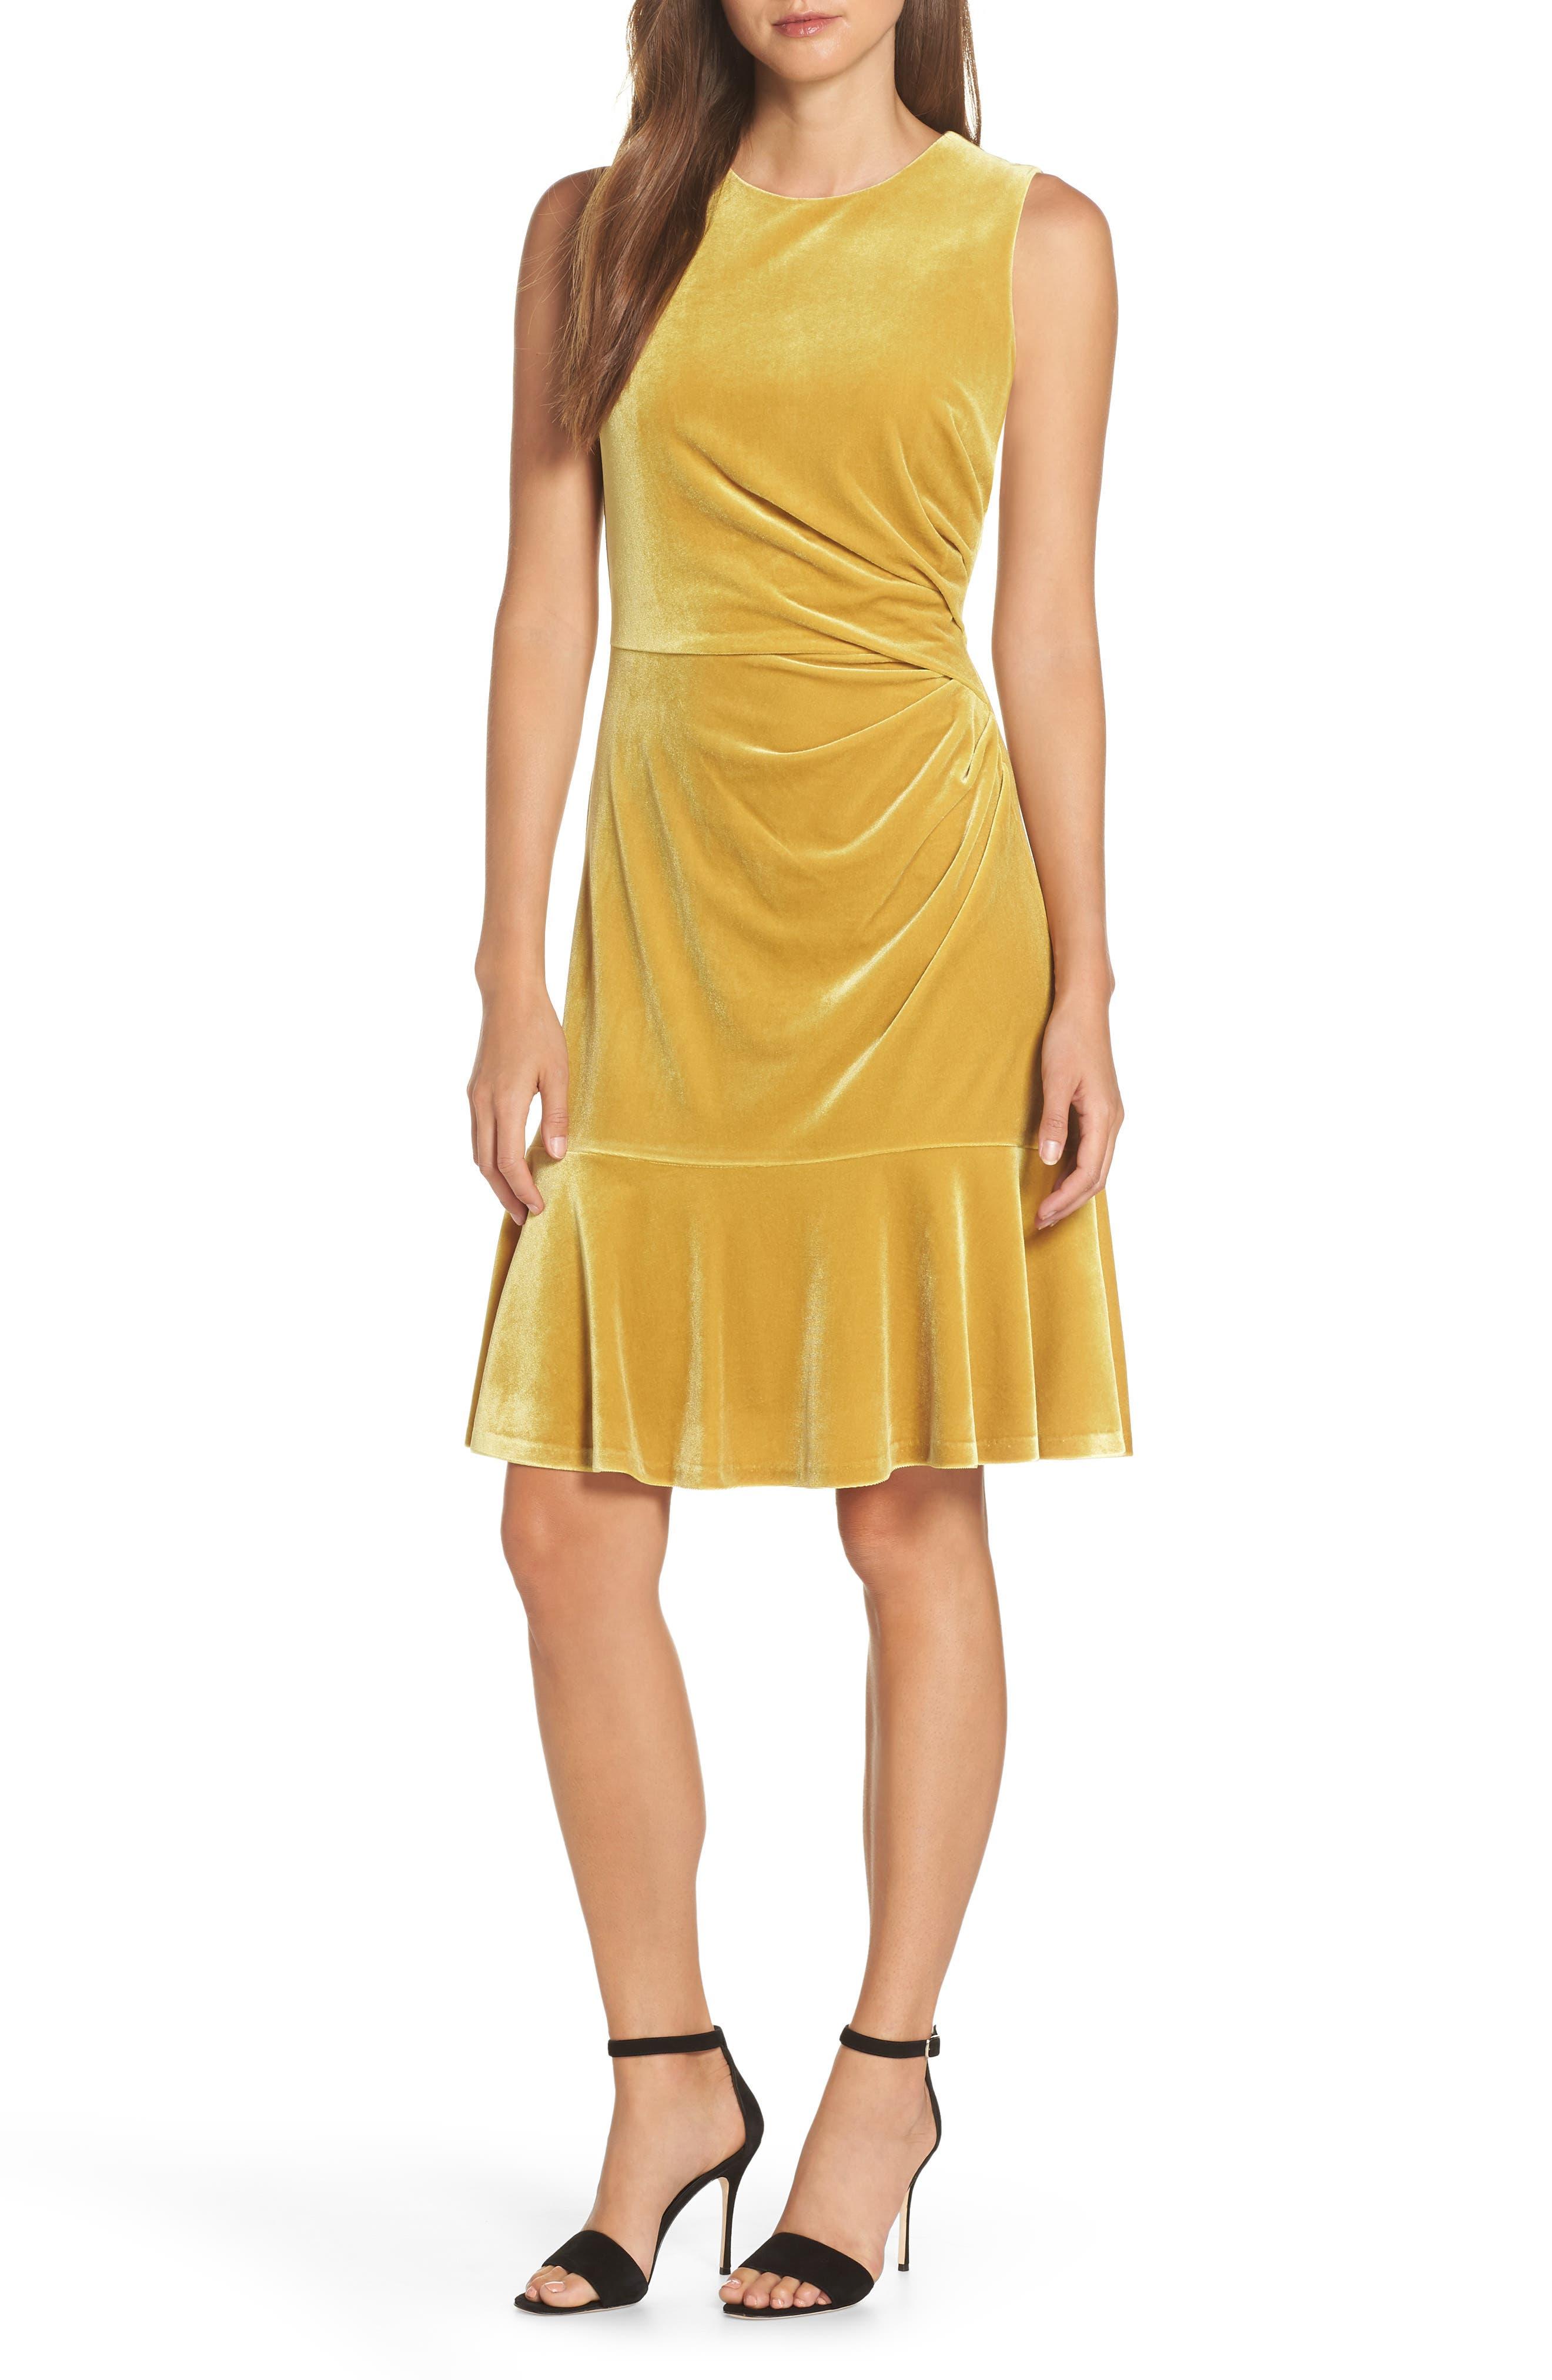 Great Gatsby Dress – Great Gatsby Dresses for Sale Womens Eliza J Draped Velvet Sheath Dress Size 18 similar to 14W - Yellow $76.80 AT vintagedancer.com